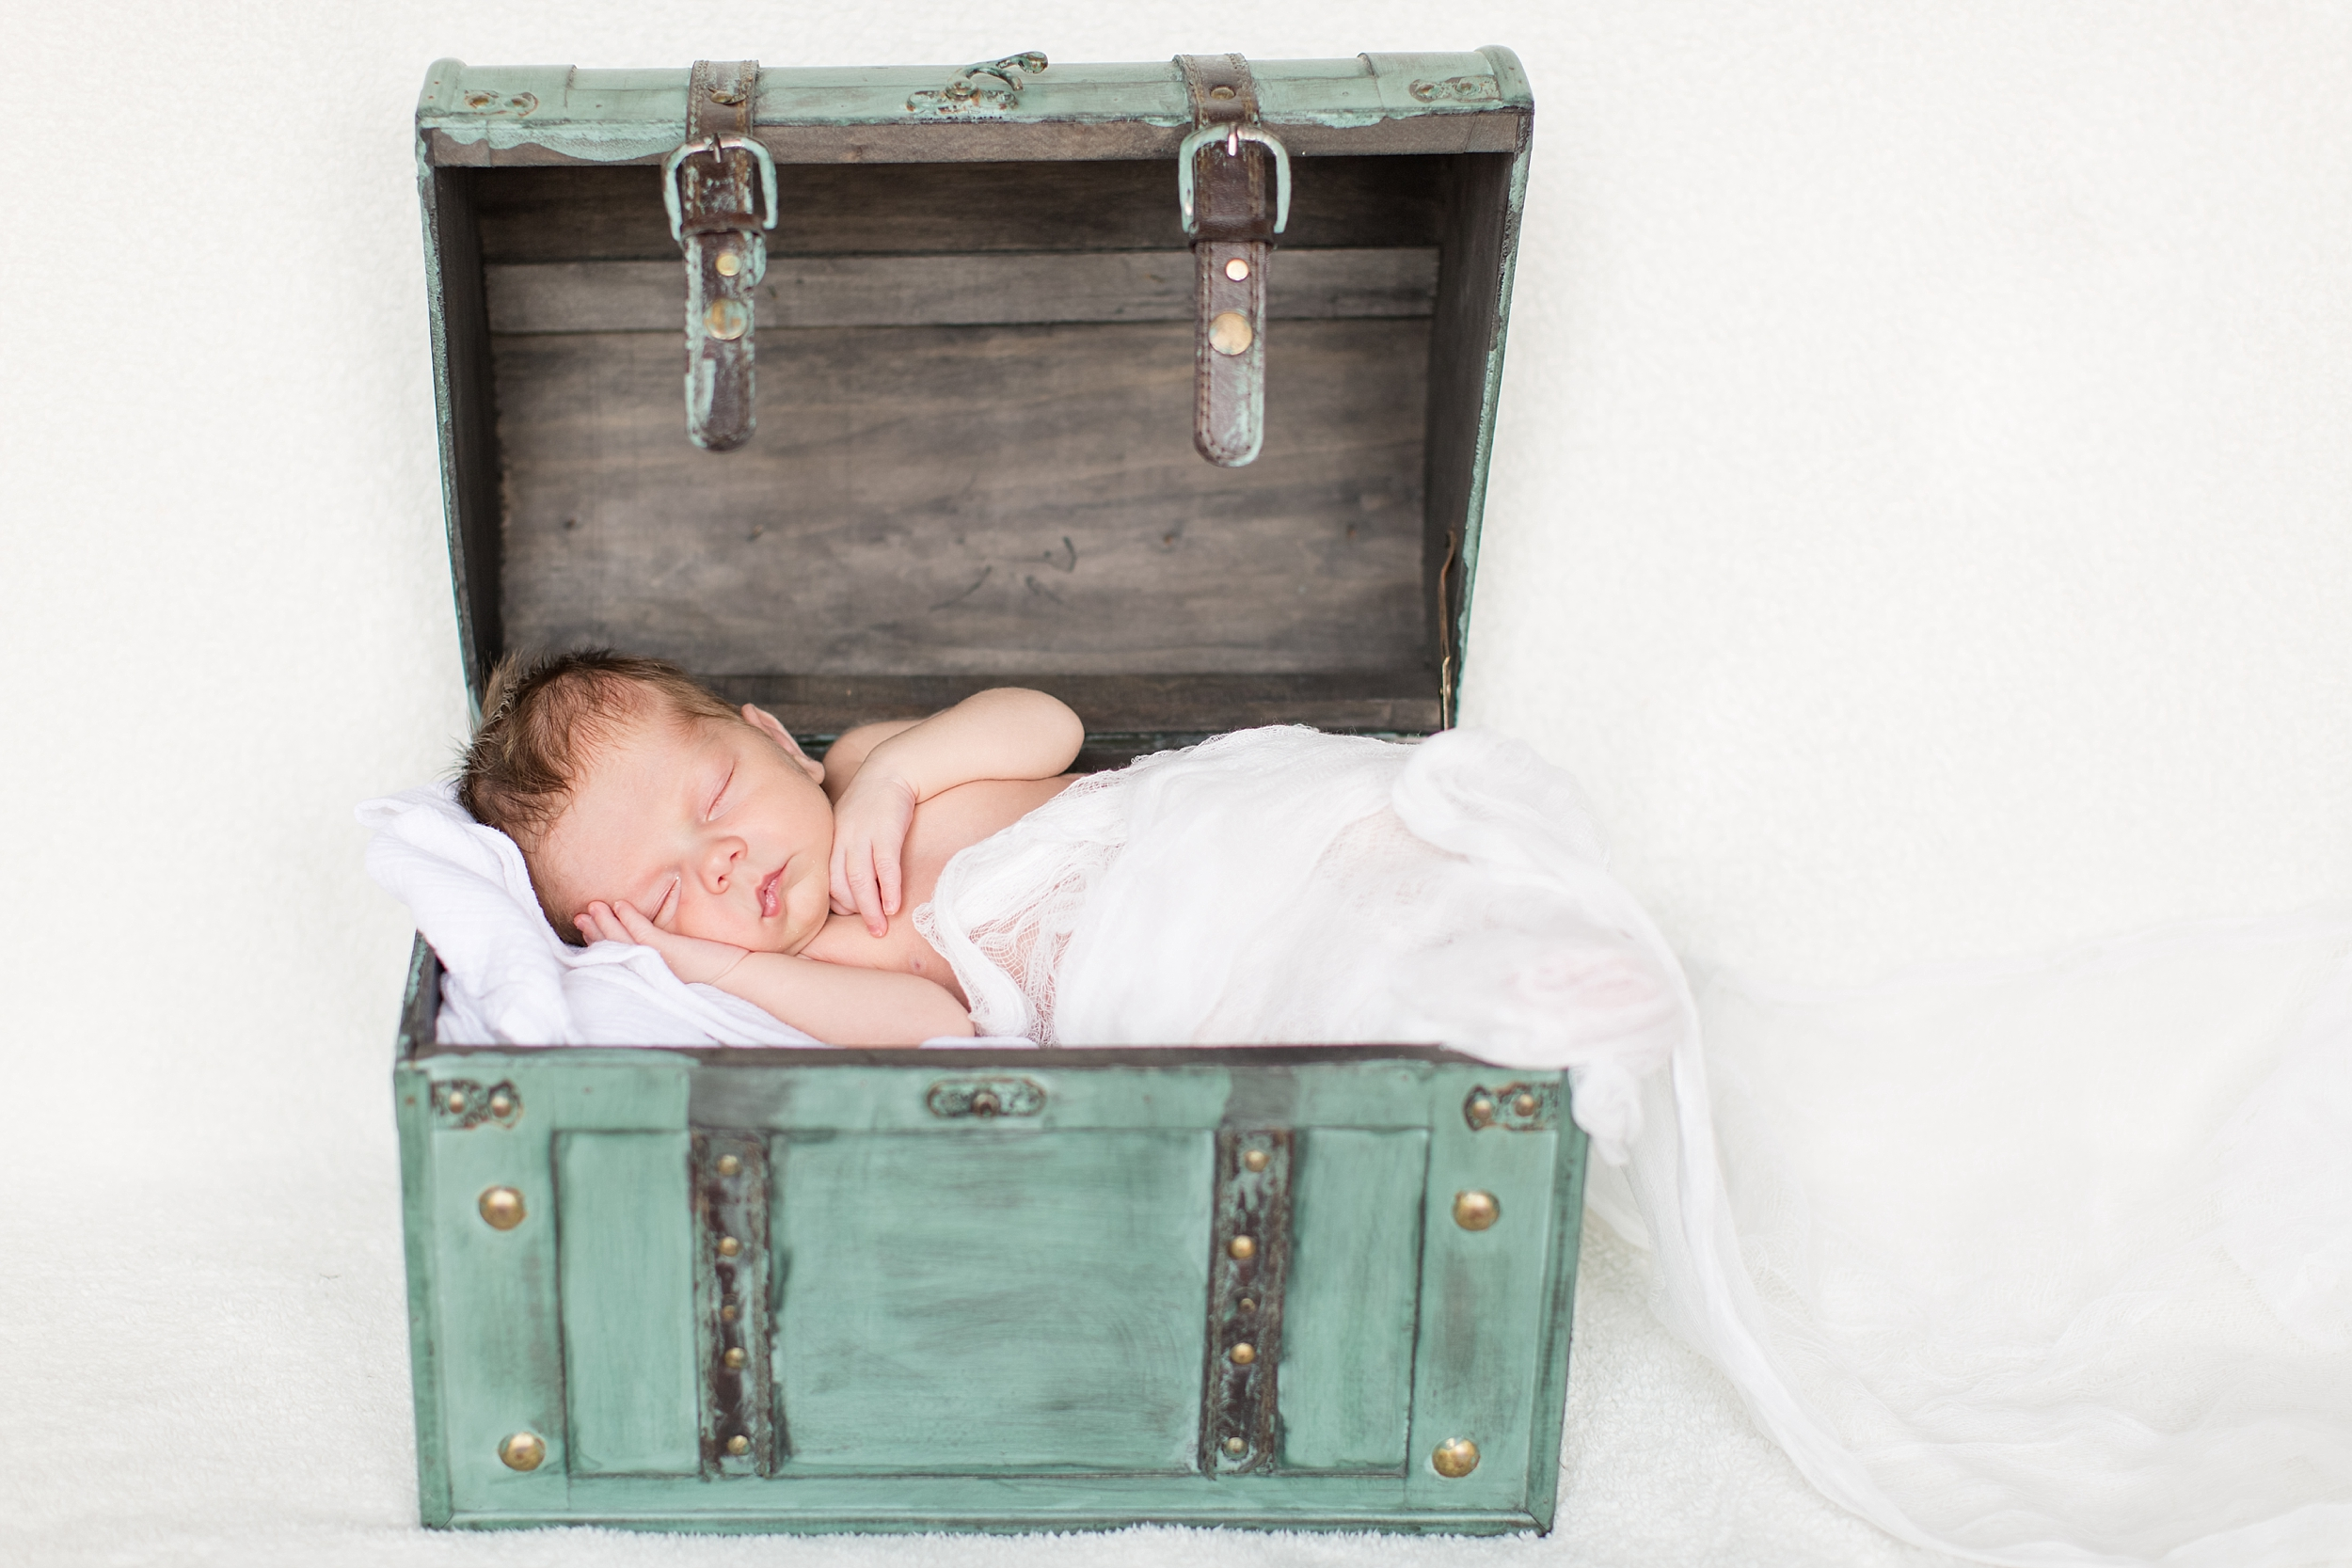 Landon-Schneider-Photography-Newborn-Session-Texas_0101.jpg